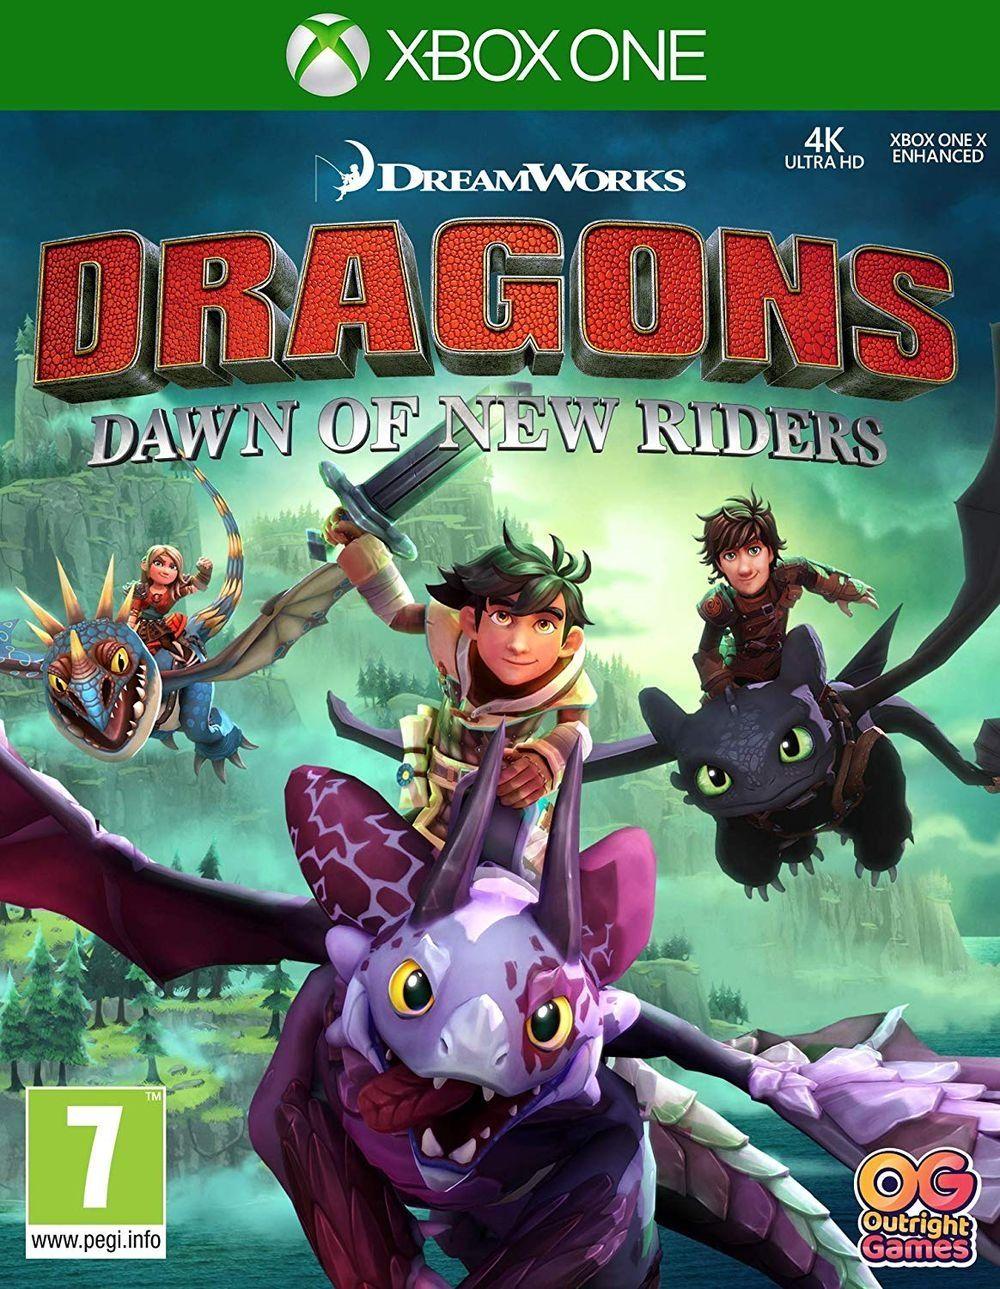 Dreamworks Dragons: Dawn of New Riders (Xbox One) - 1